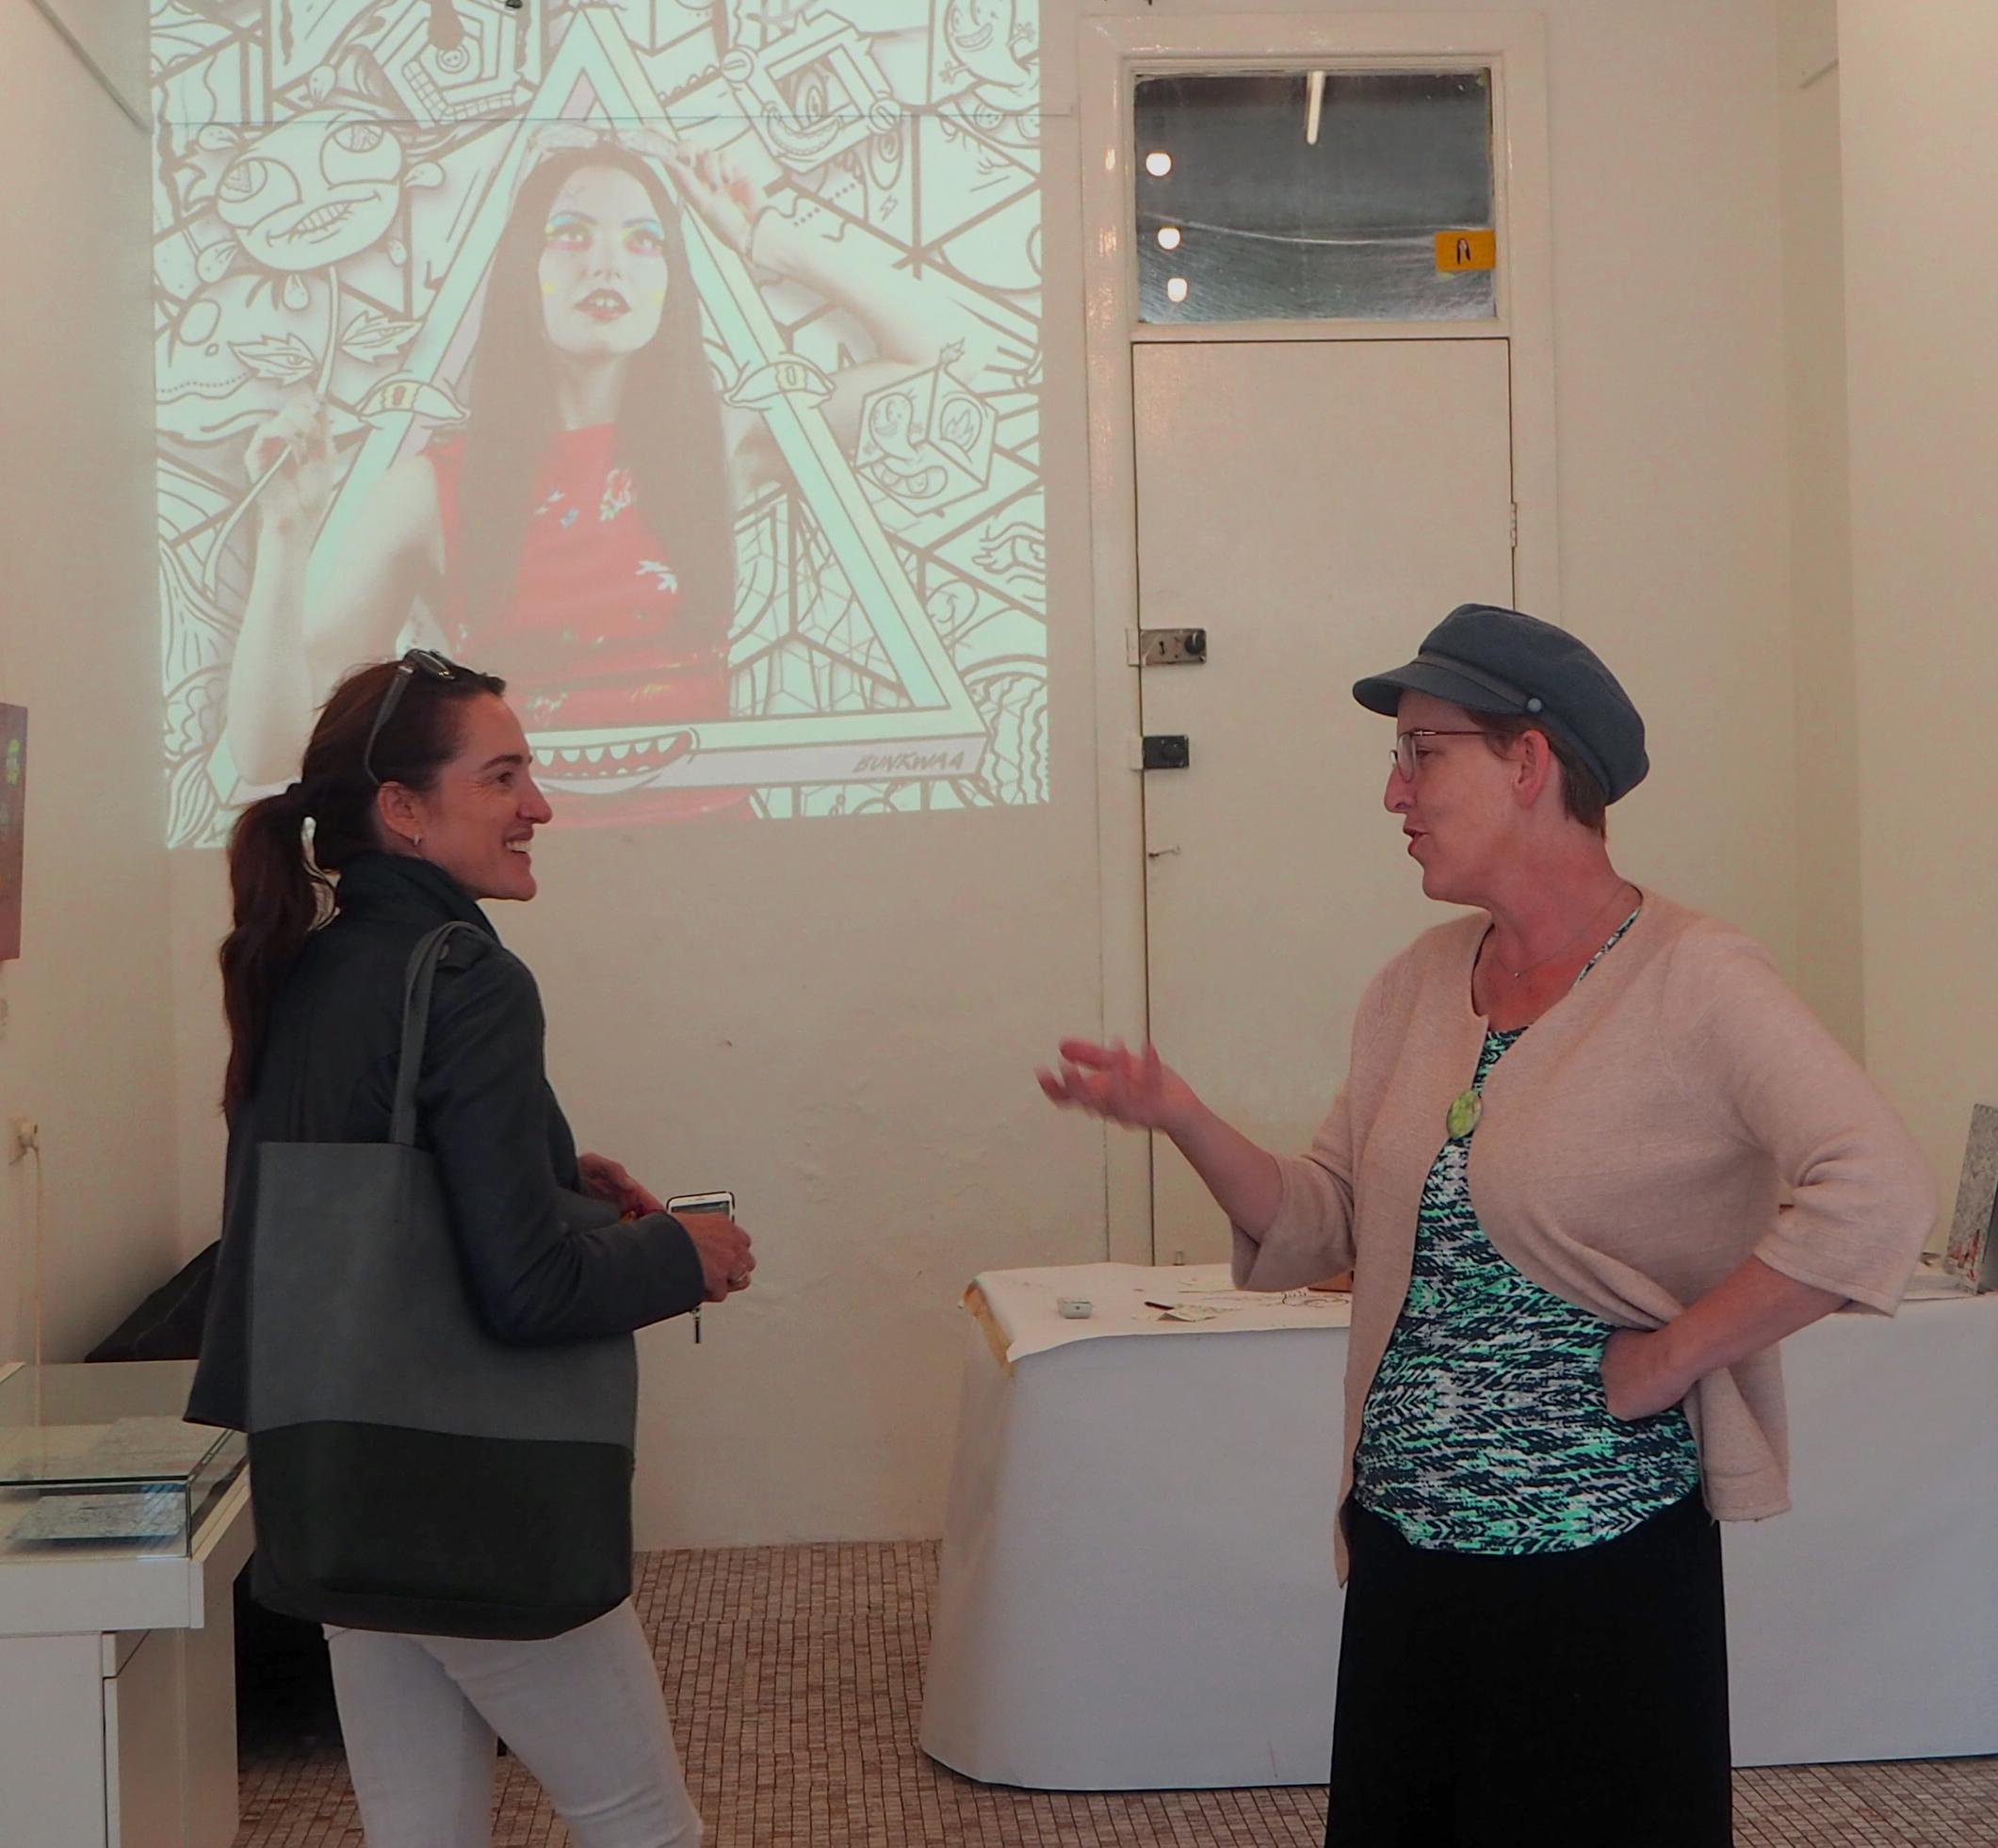 Sophia de Mestre on Culture Scouts walking tour with Bess O'Malley